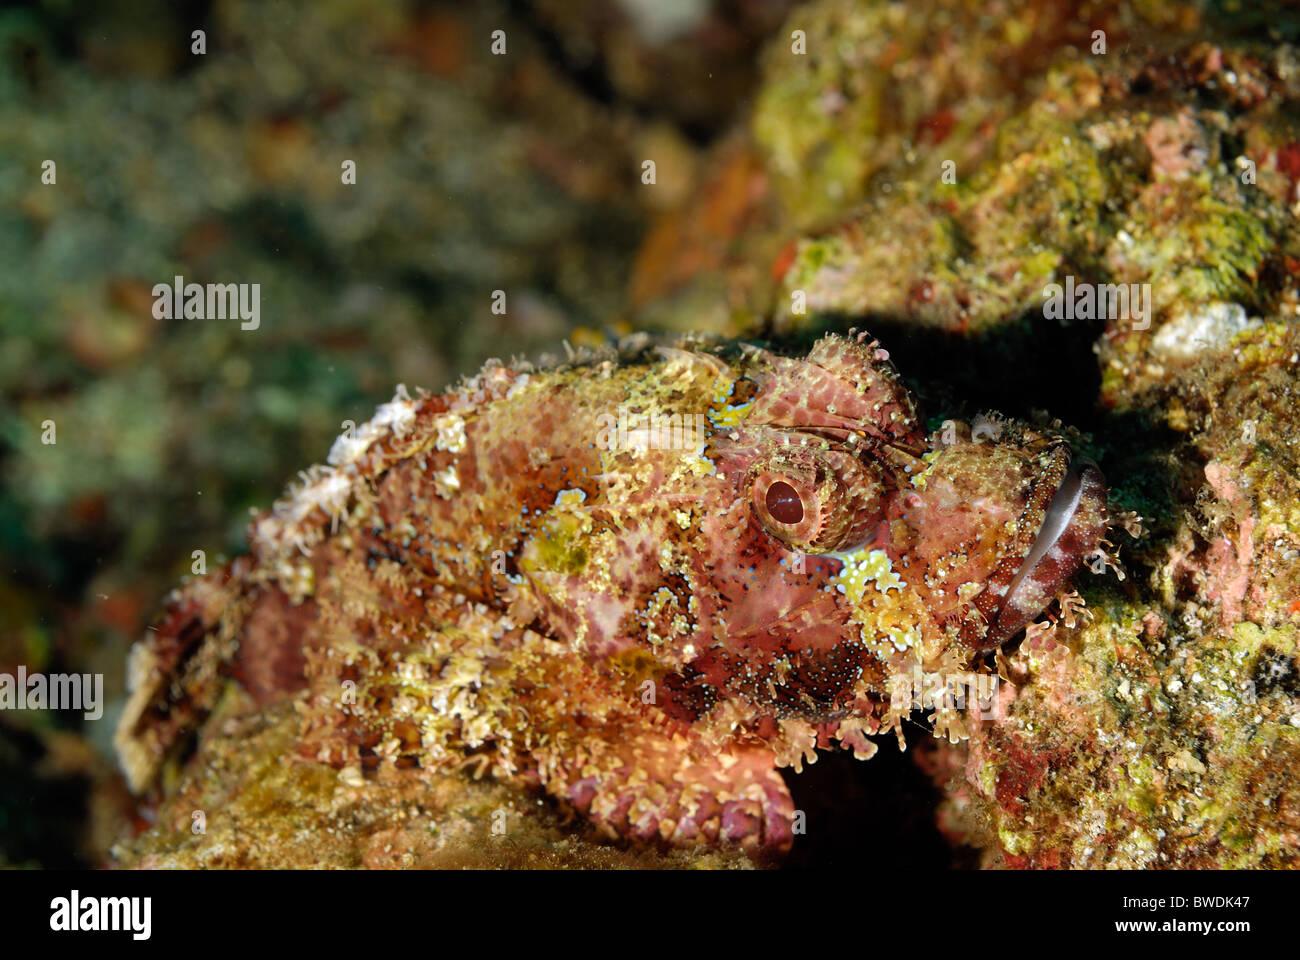 Testa piatta Scorpion Fish Scorpaenopsis oxycephalus, Scorpenidae, Tulamben Bali, Indonesia, Asia Immagini Stock